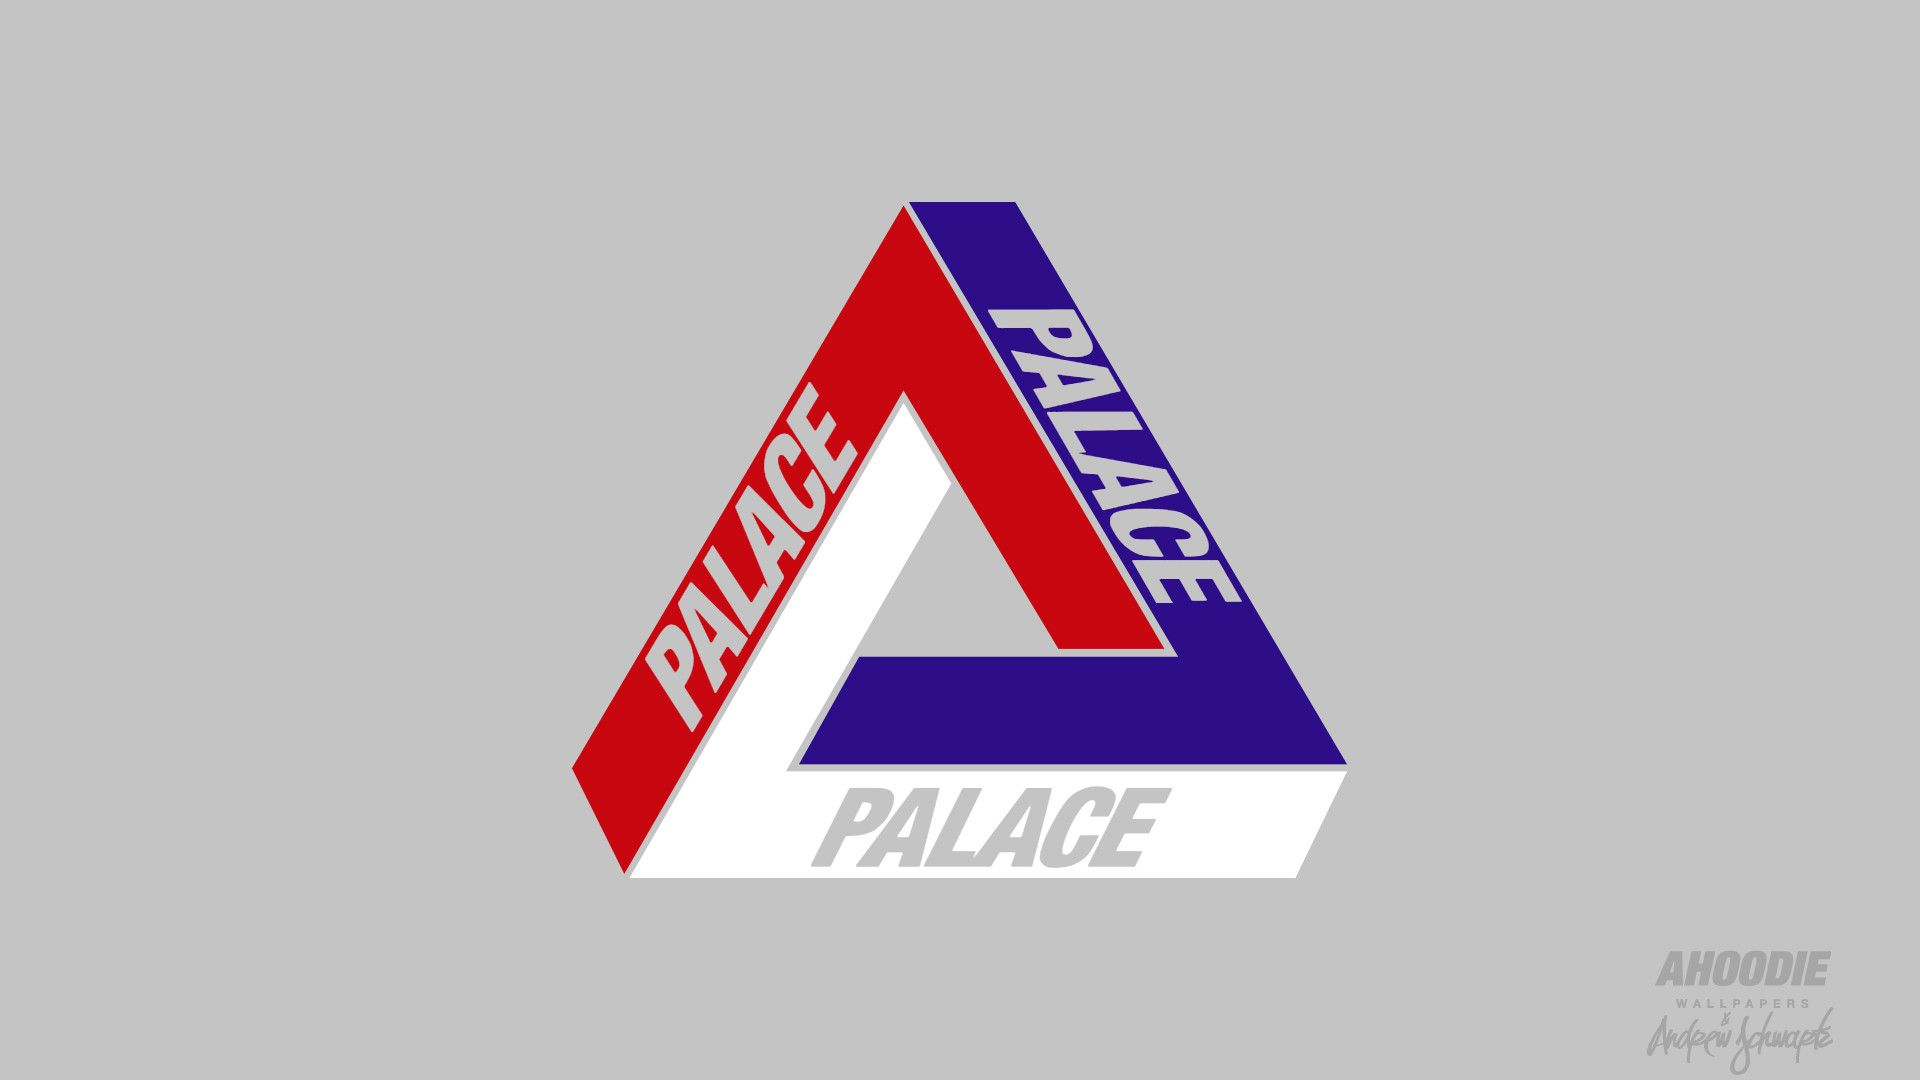 1920x1080 (With images) Skateboard logo, Palace